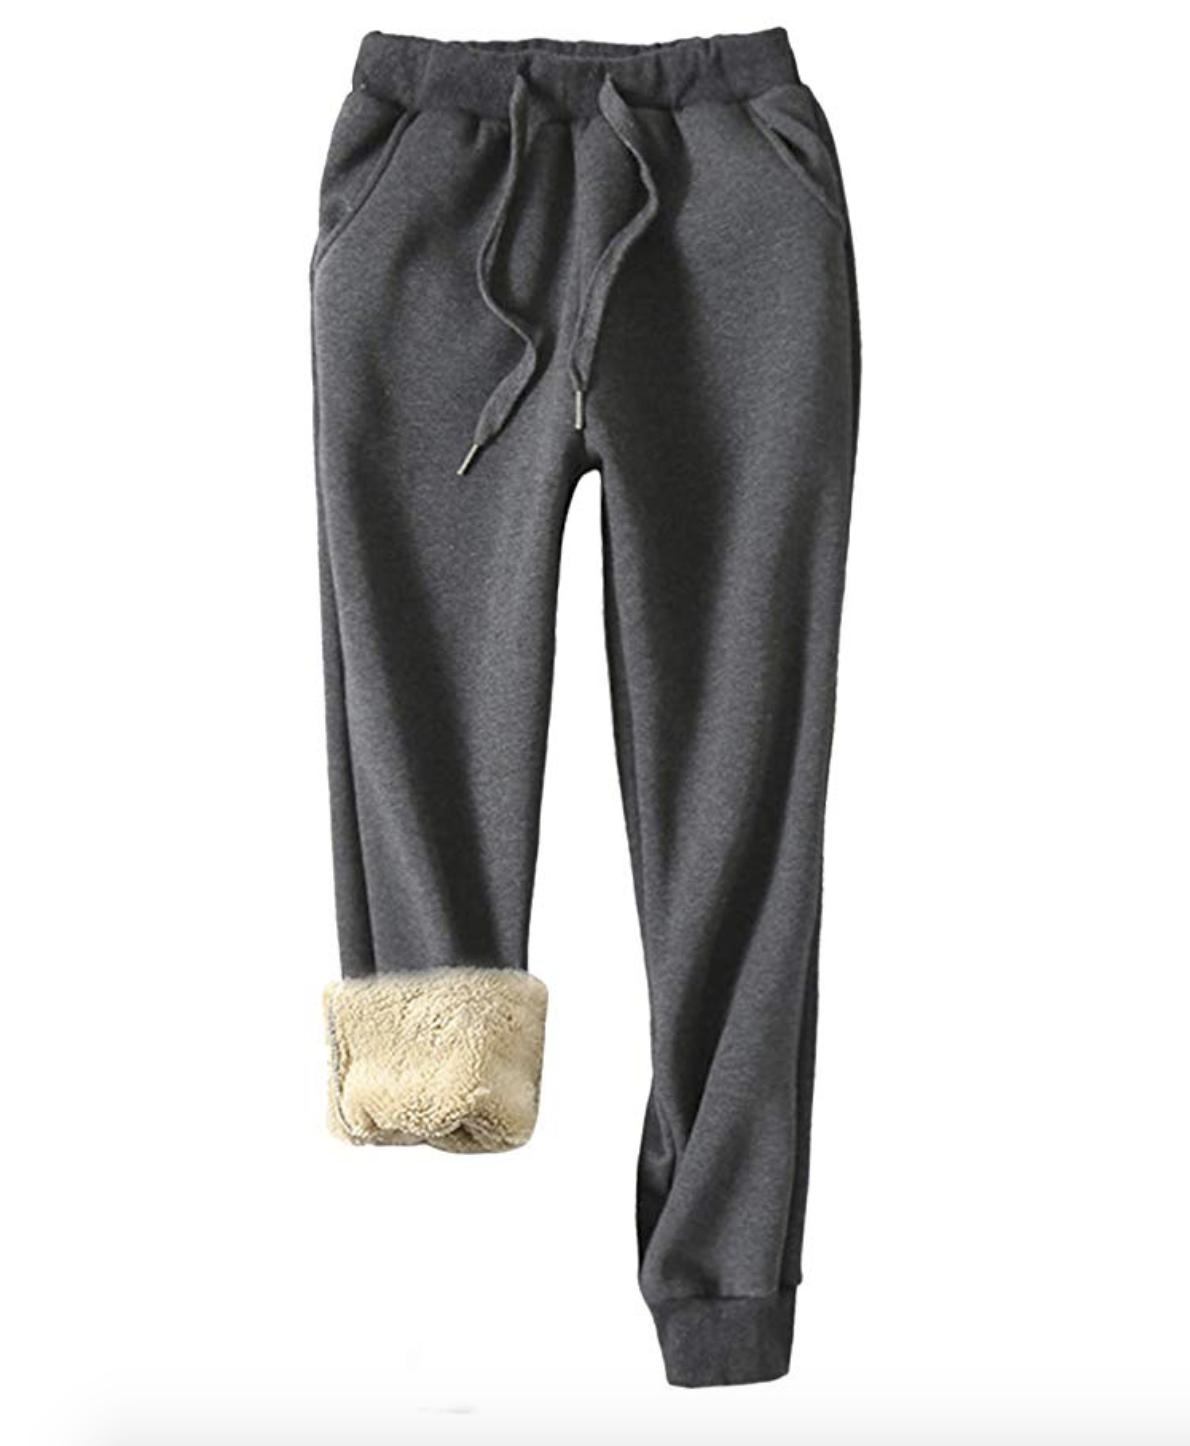 Yeokou Women's Warm Sherpa Lined Athletic Sweatpants Jogger Fleece Pants